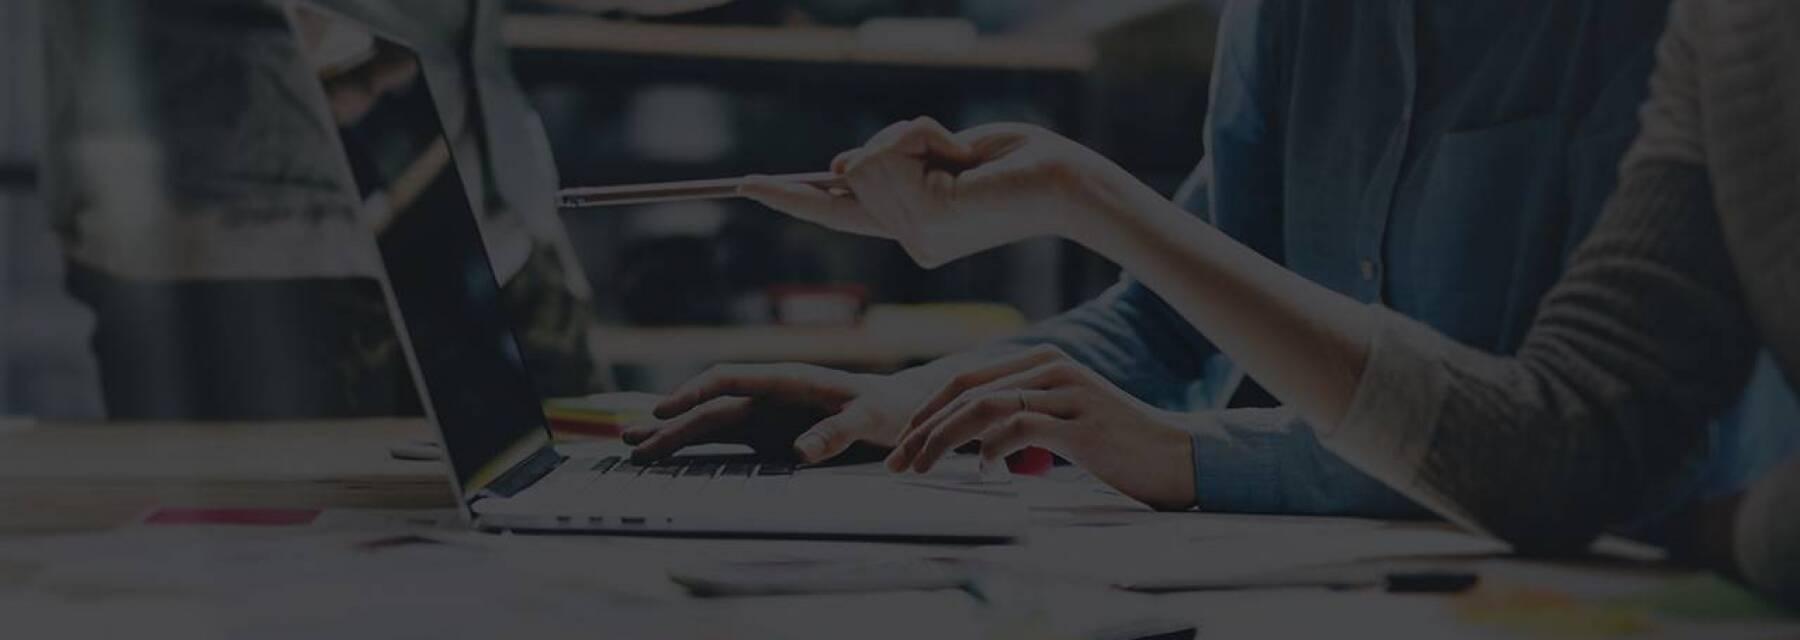 Custom Web Application Development Services Company